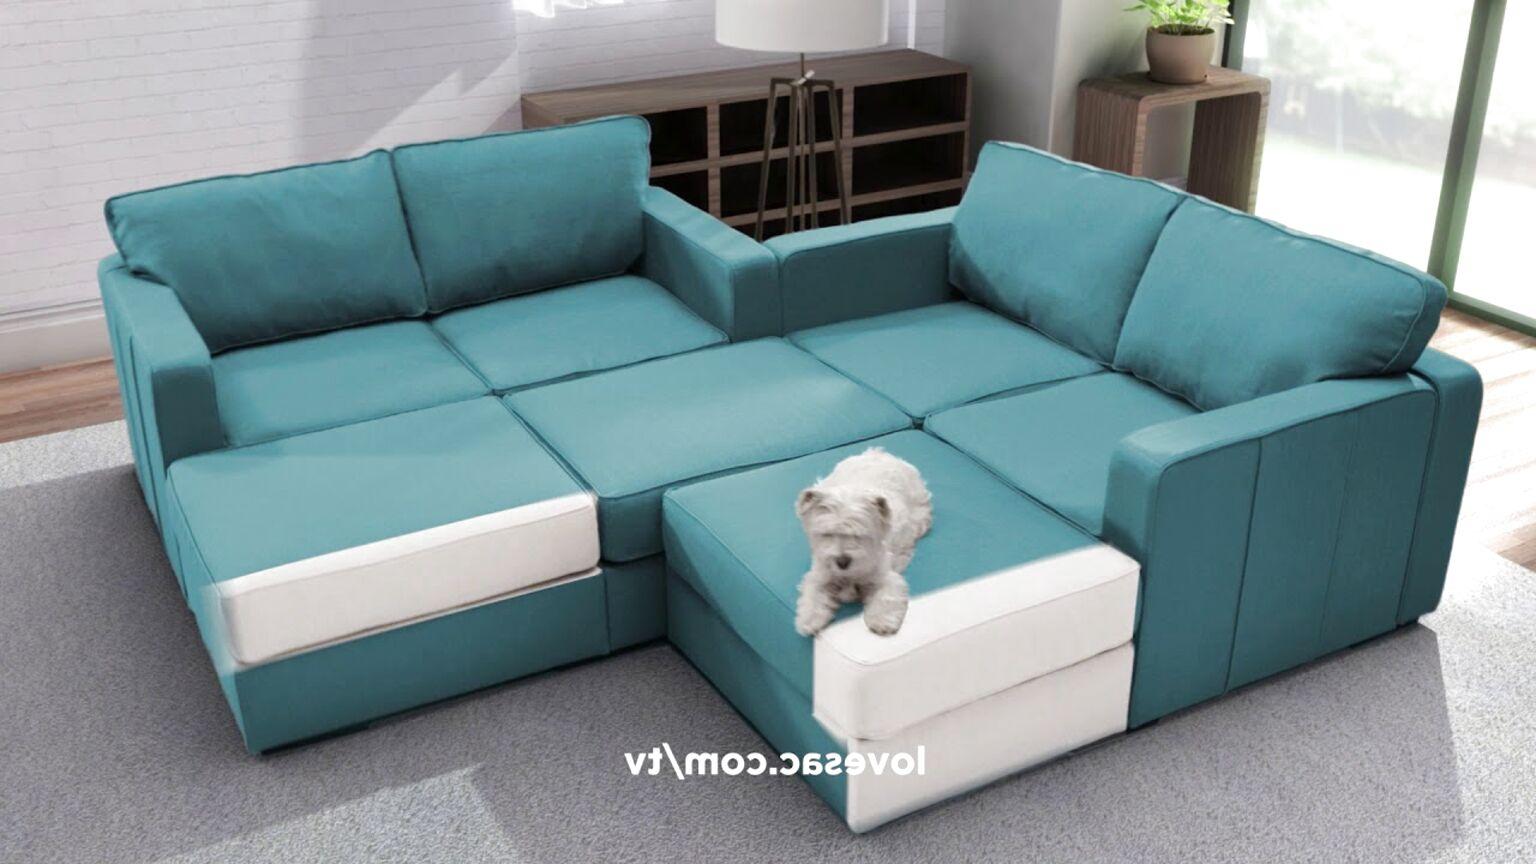 maxresdefault lovesac sofa